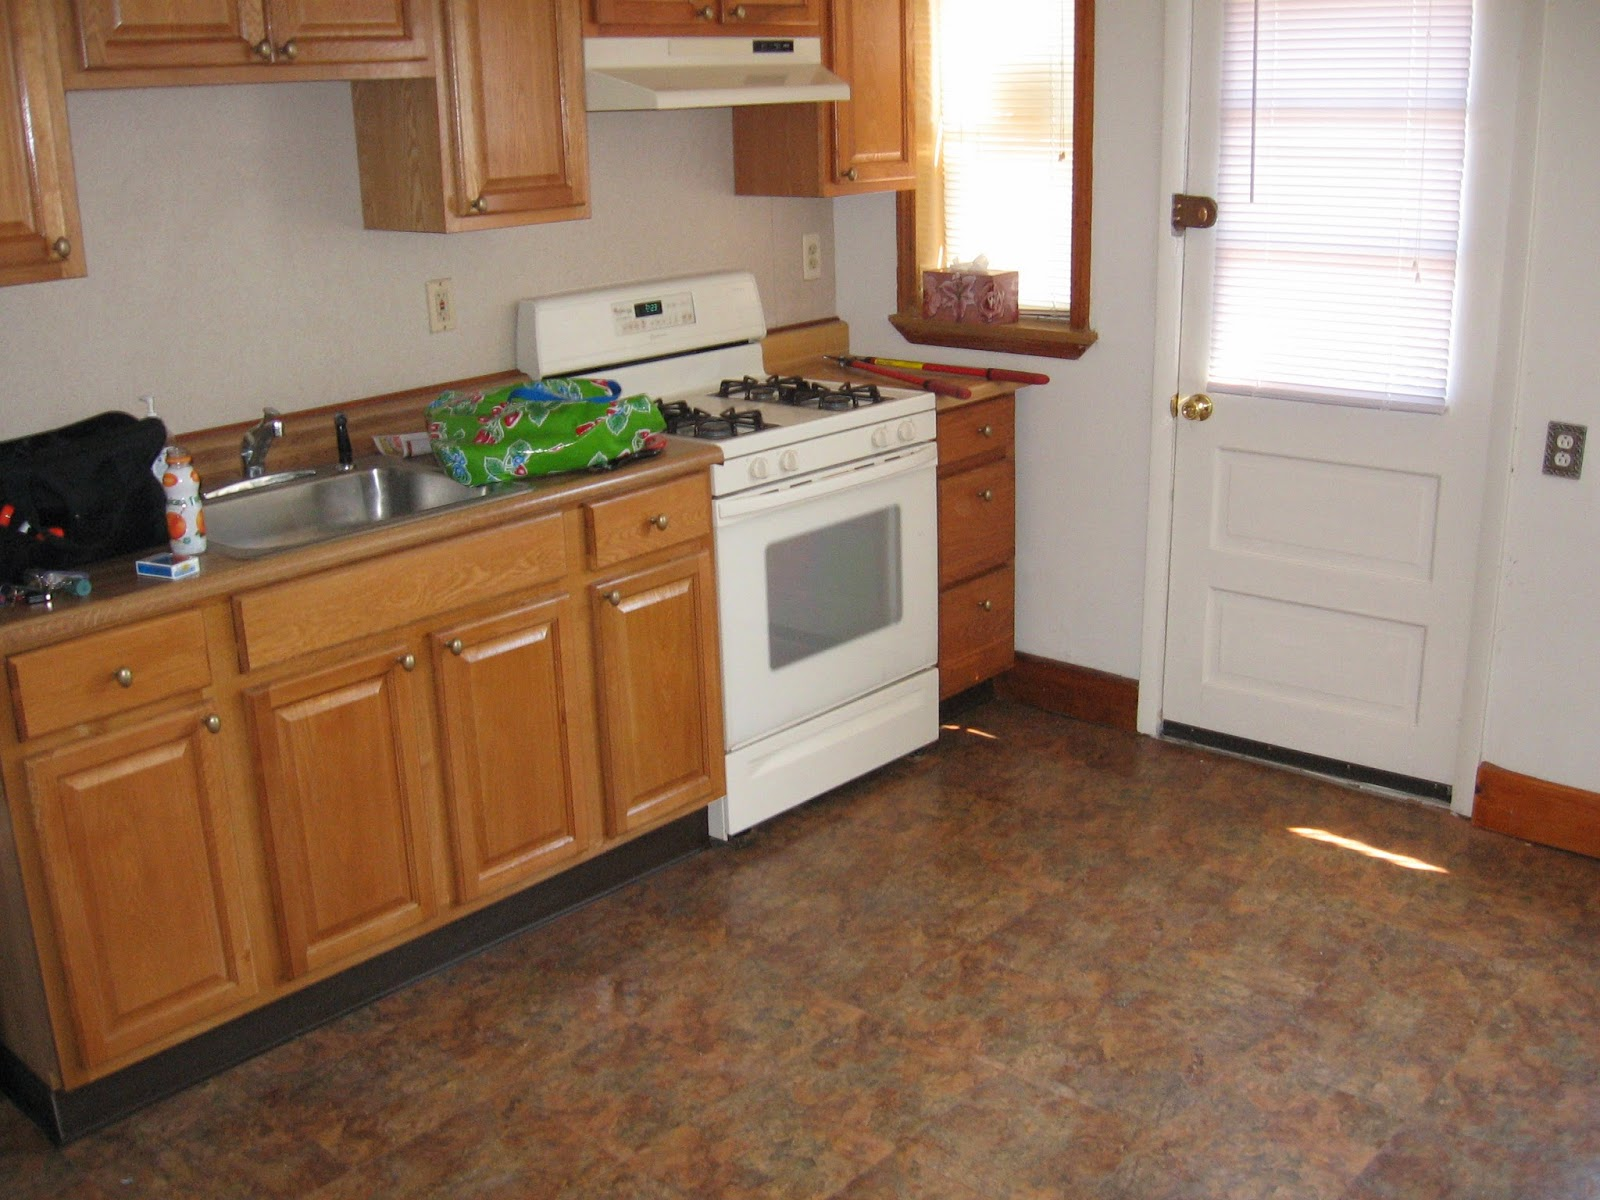 cleaning kitchen floors home depot tiles floor machines